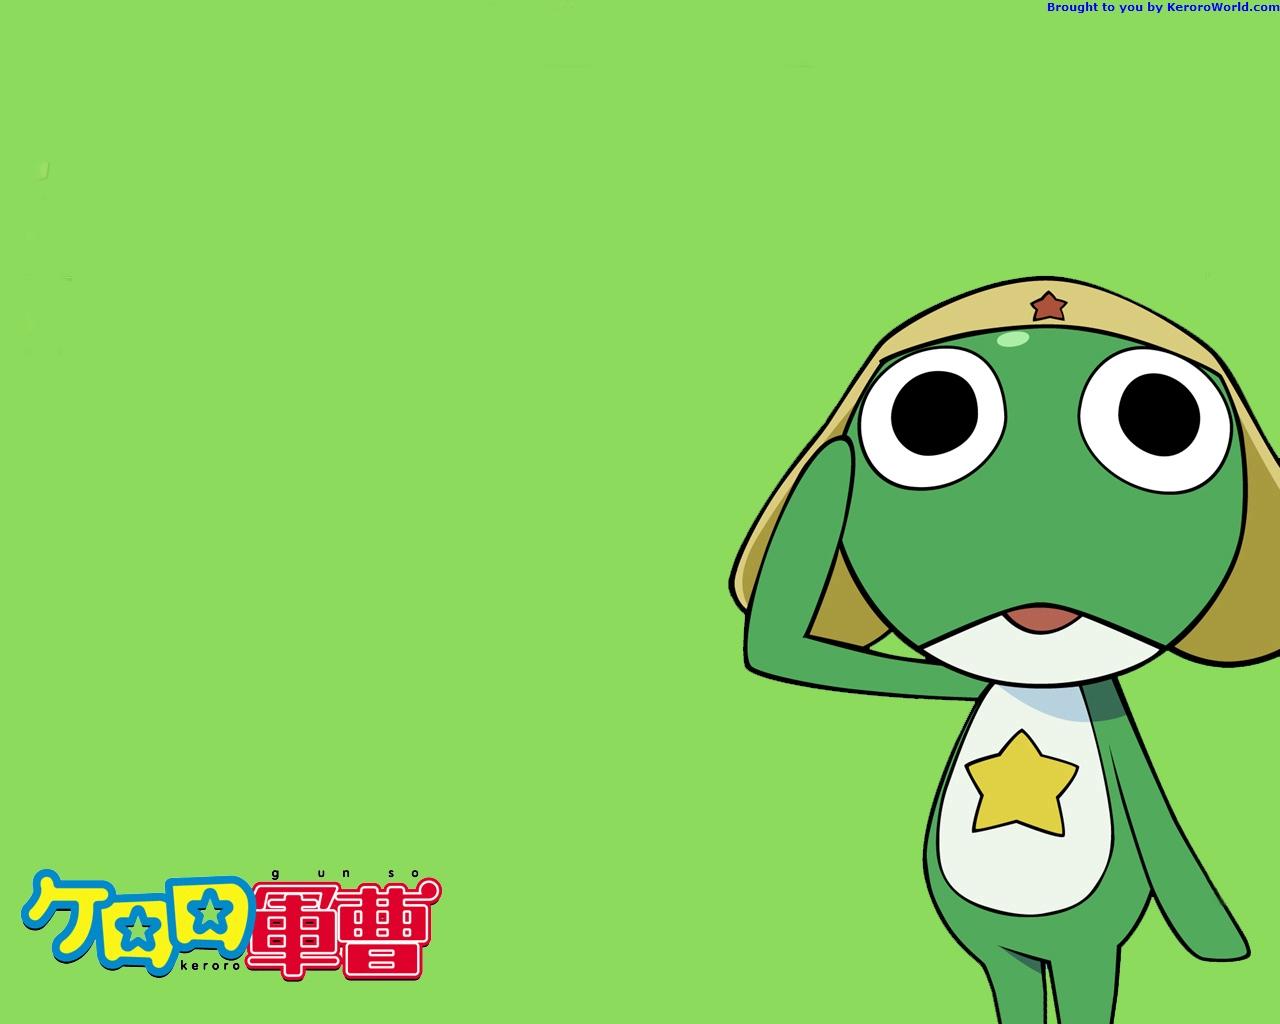 http://vignette2.wikia.nocookie.net/creepypasta/images/c/cd/Keroro-Gunso-Wallpaper-anime-25246094-1280-1024.jpg/revision/latest?cb=20130409000430